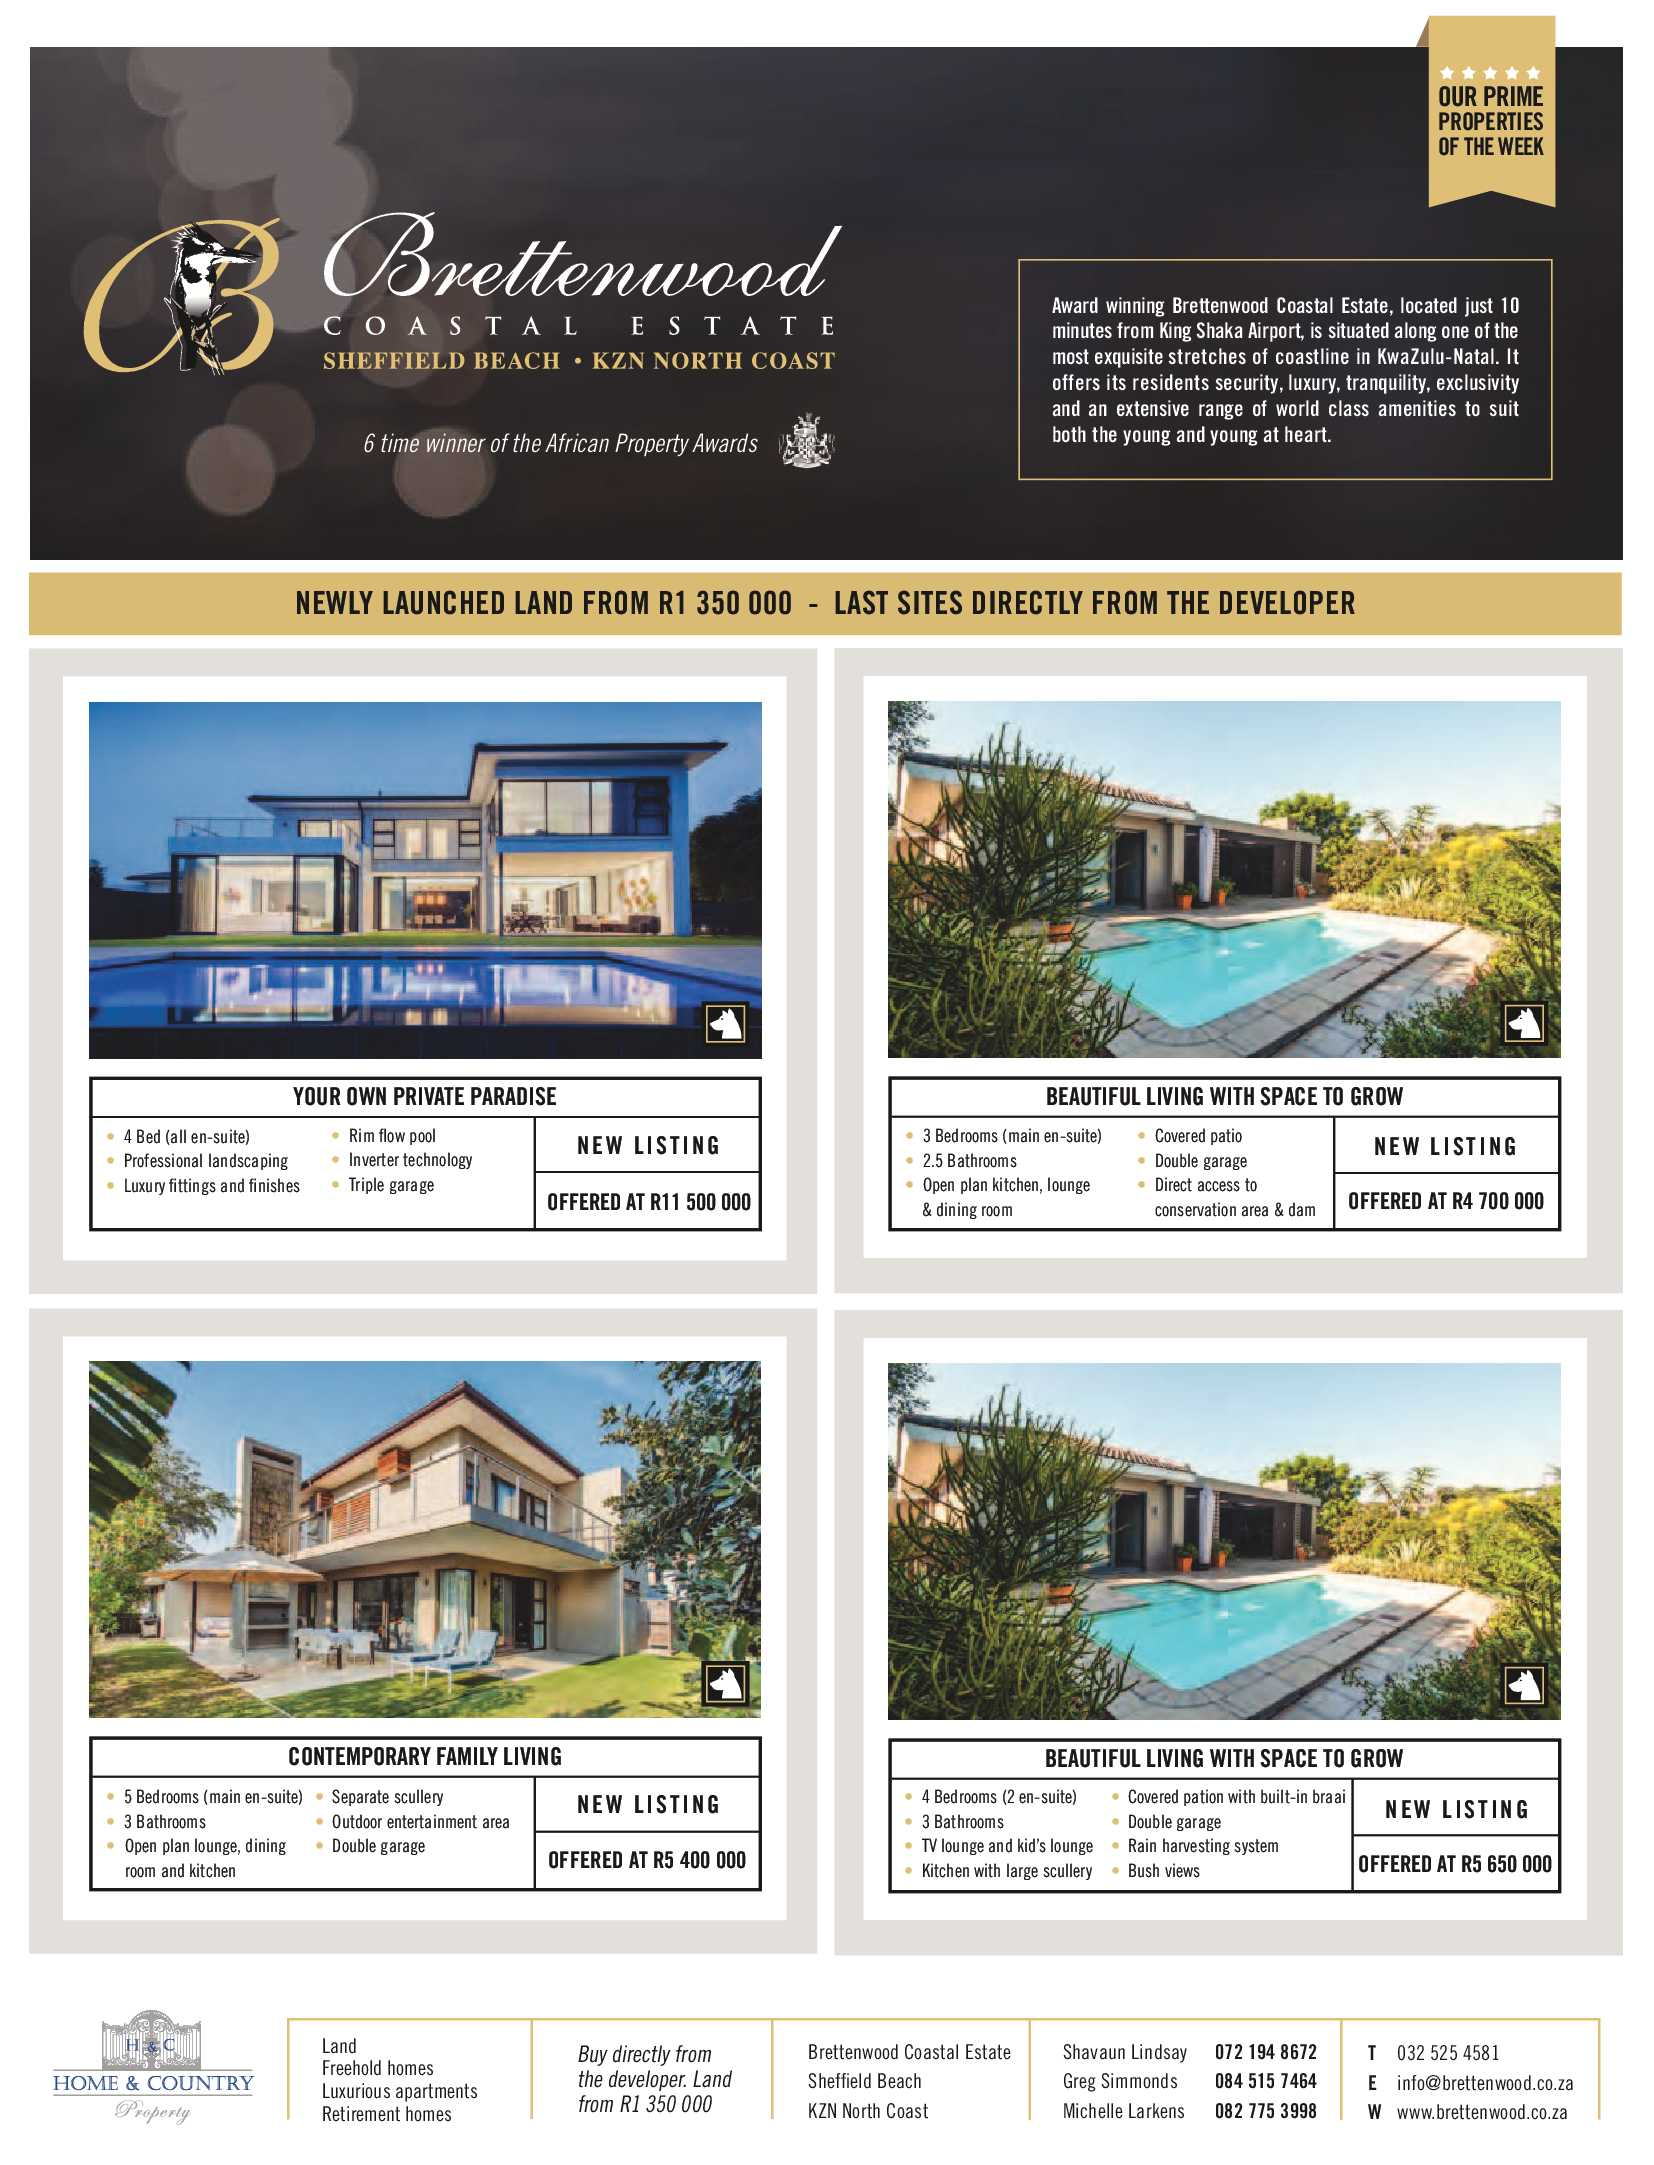 get-magazine-ballitoumhlanga-july-2017-2-epapers-page-48